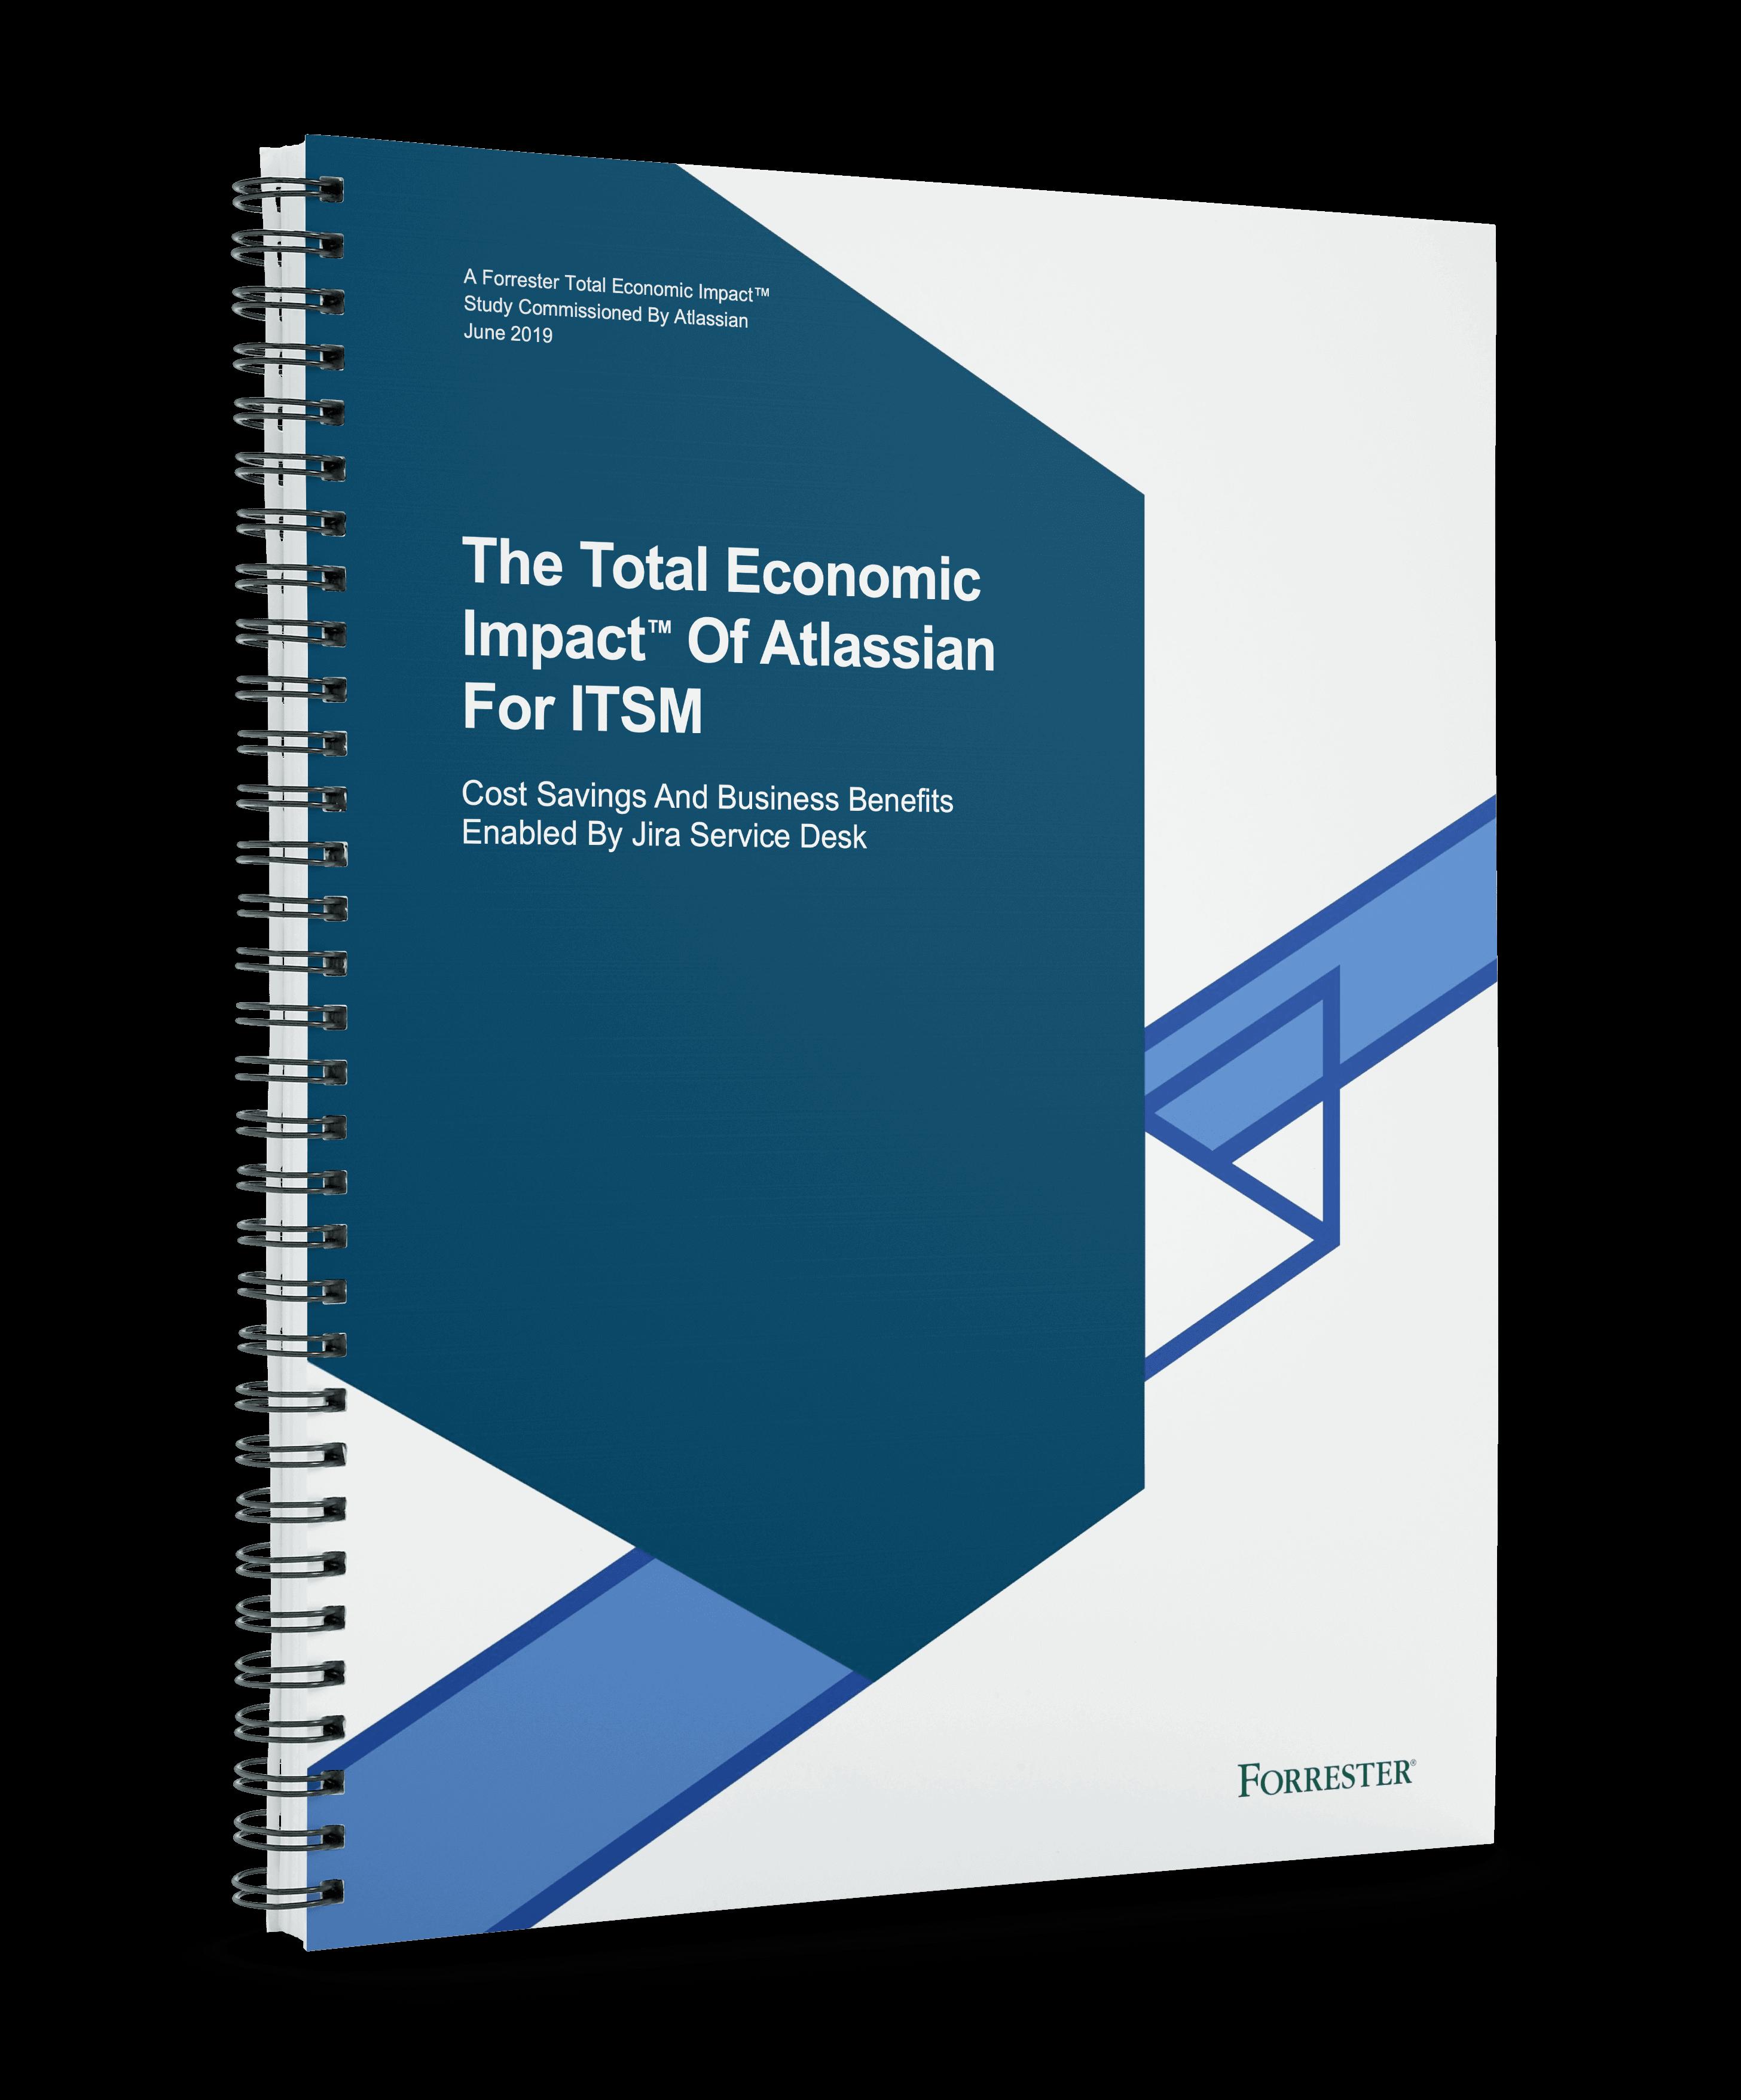 The Total Economic Impact™ Of Atlassian For ITSM 图书封面